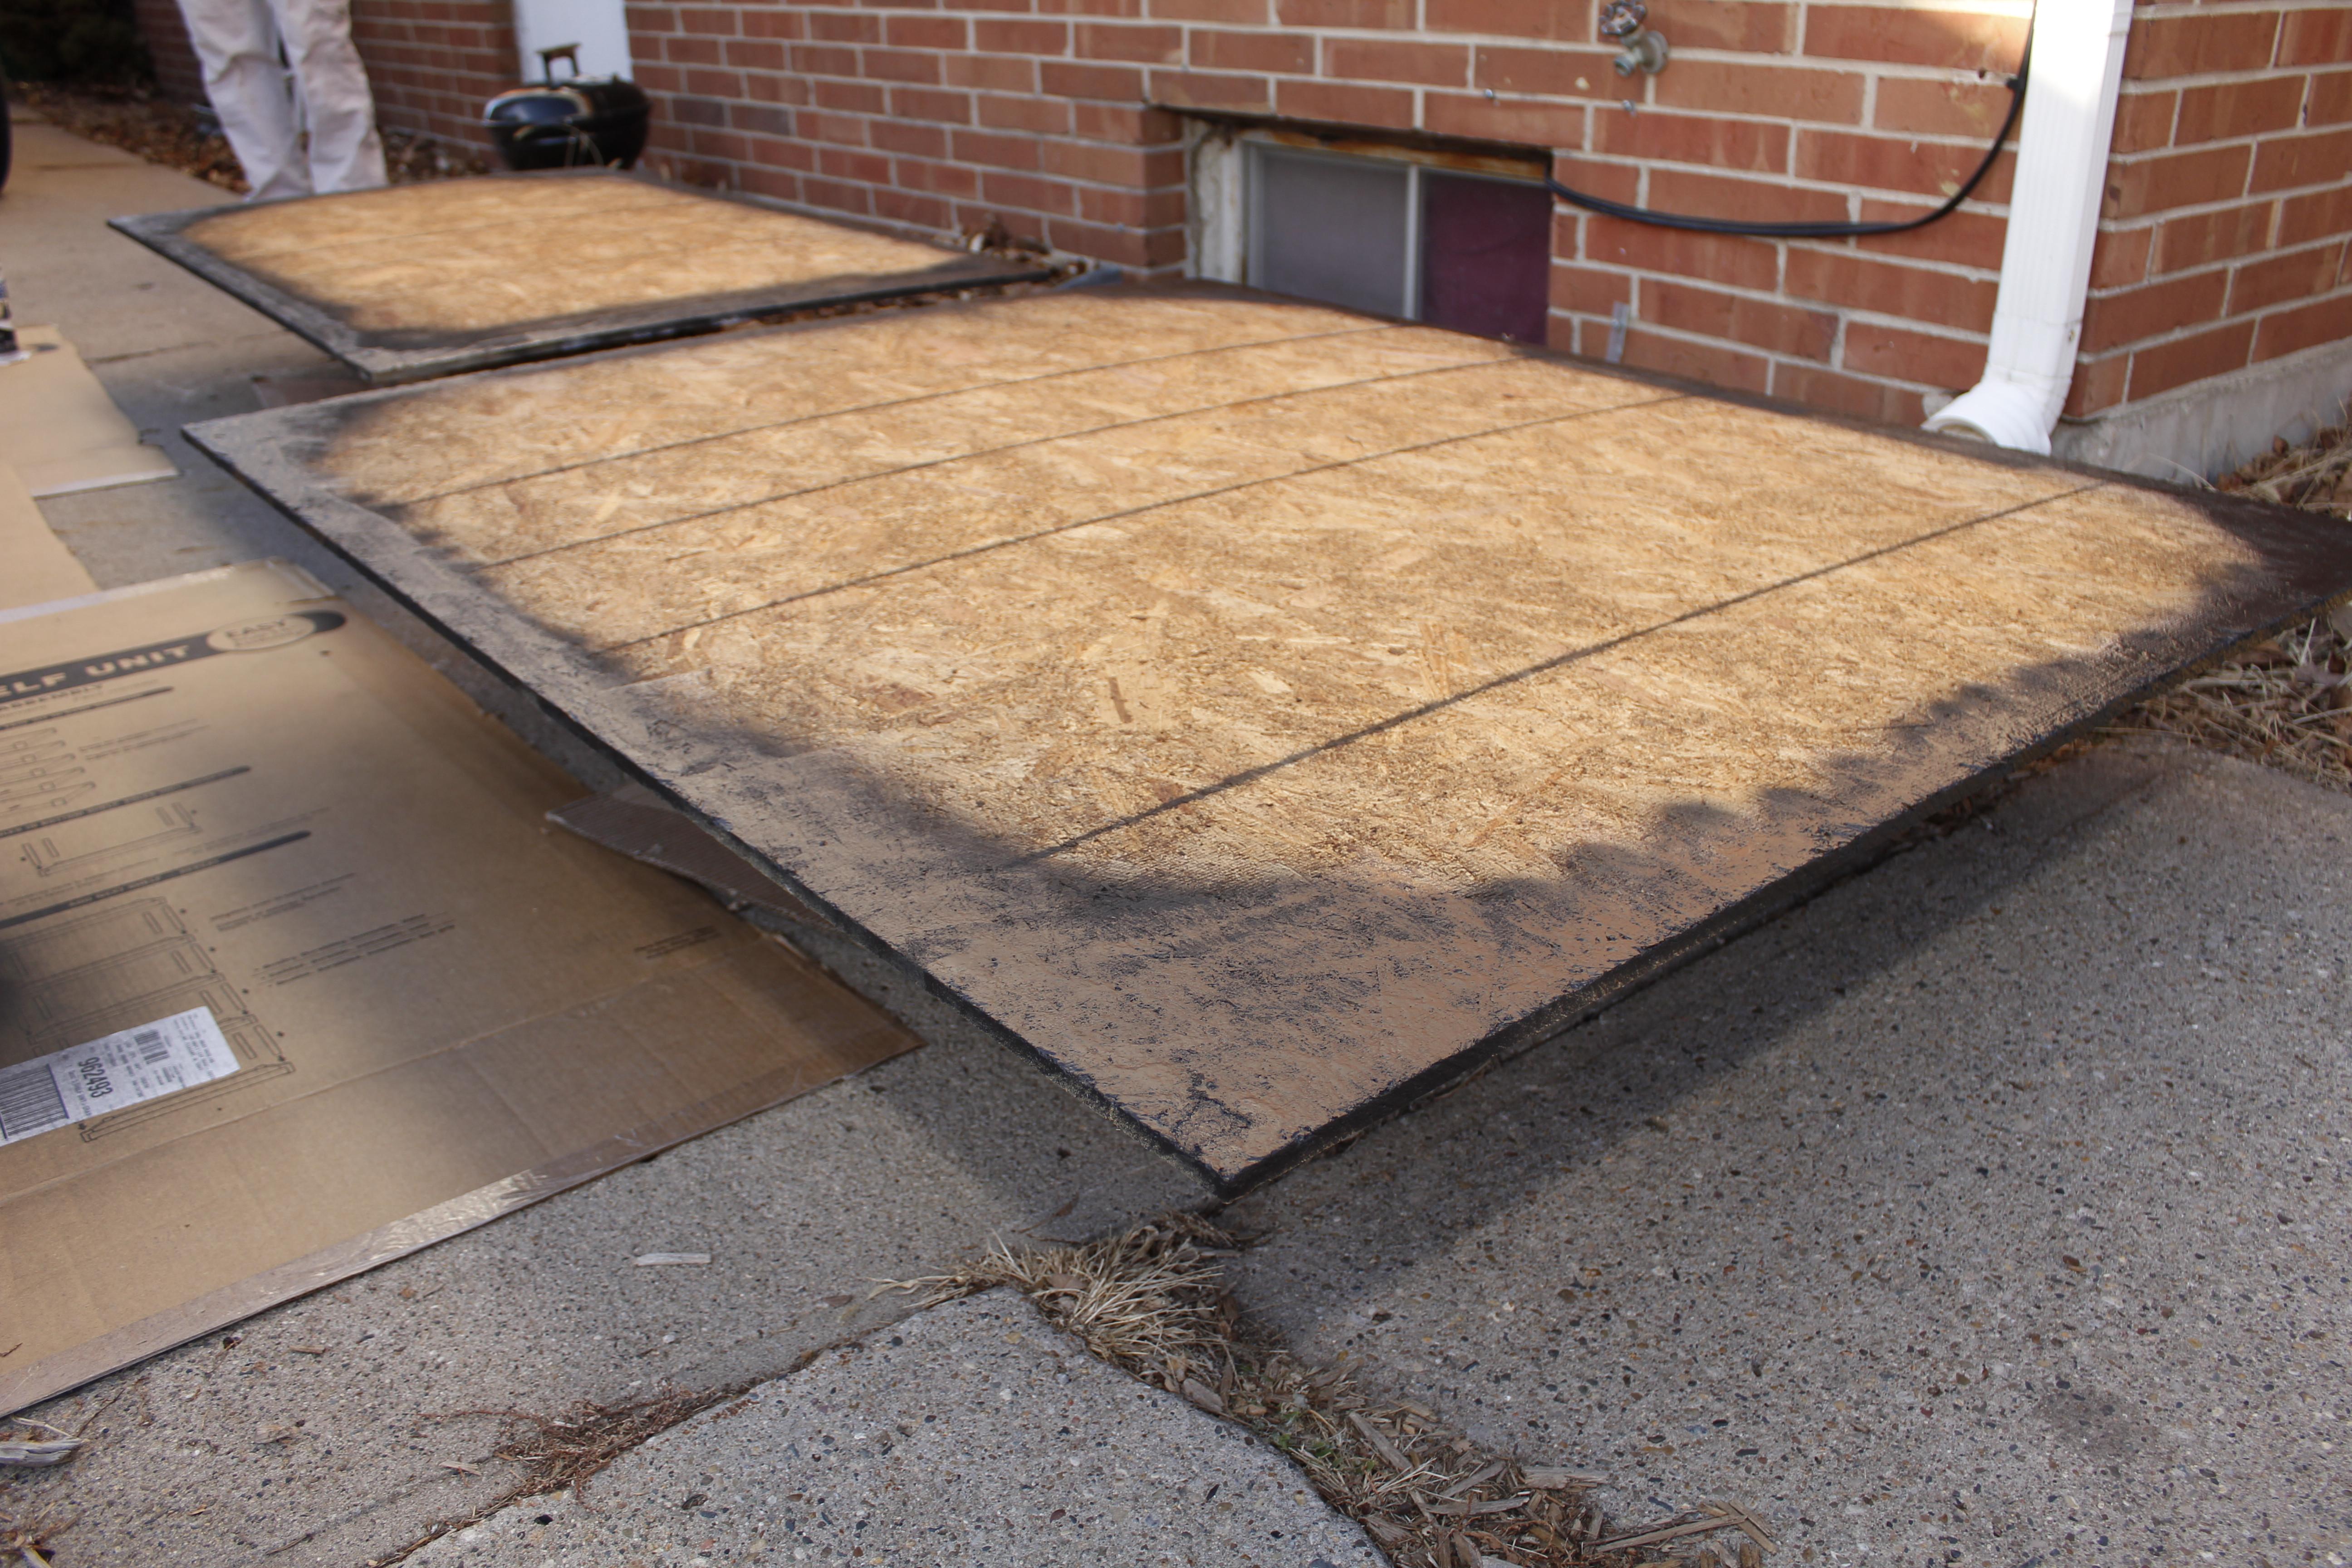 Best ideas about DIY Platform Bed Frame Queen . Save or Pin DIY Queen size platform bed Now.